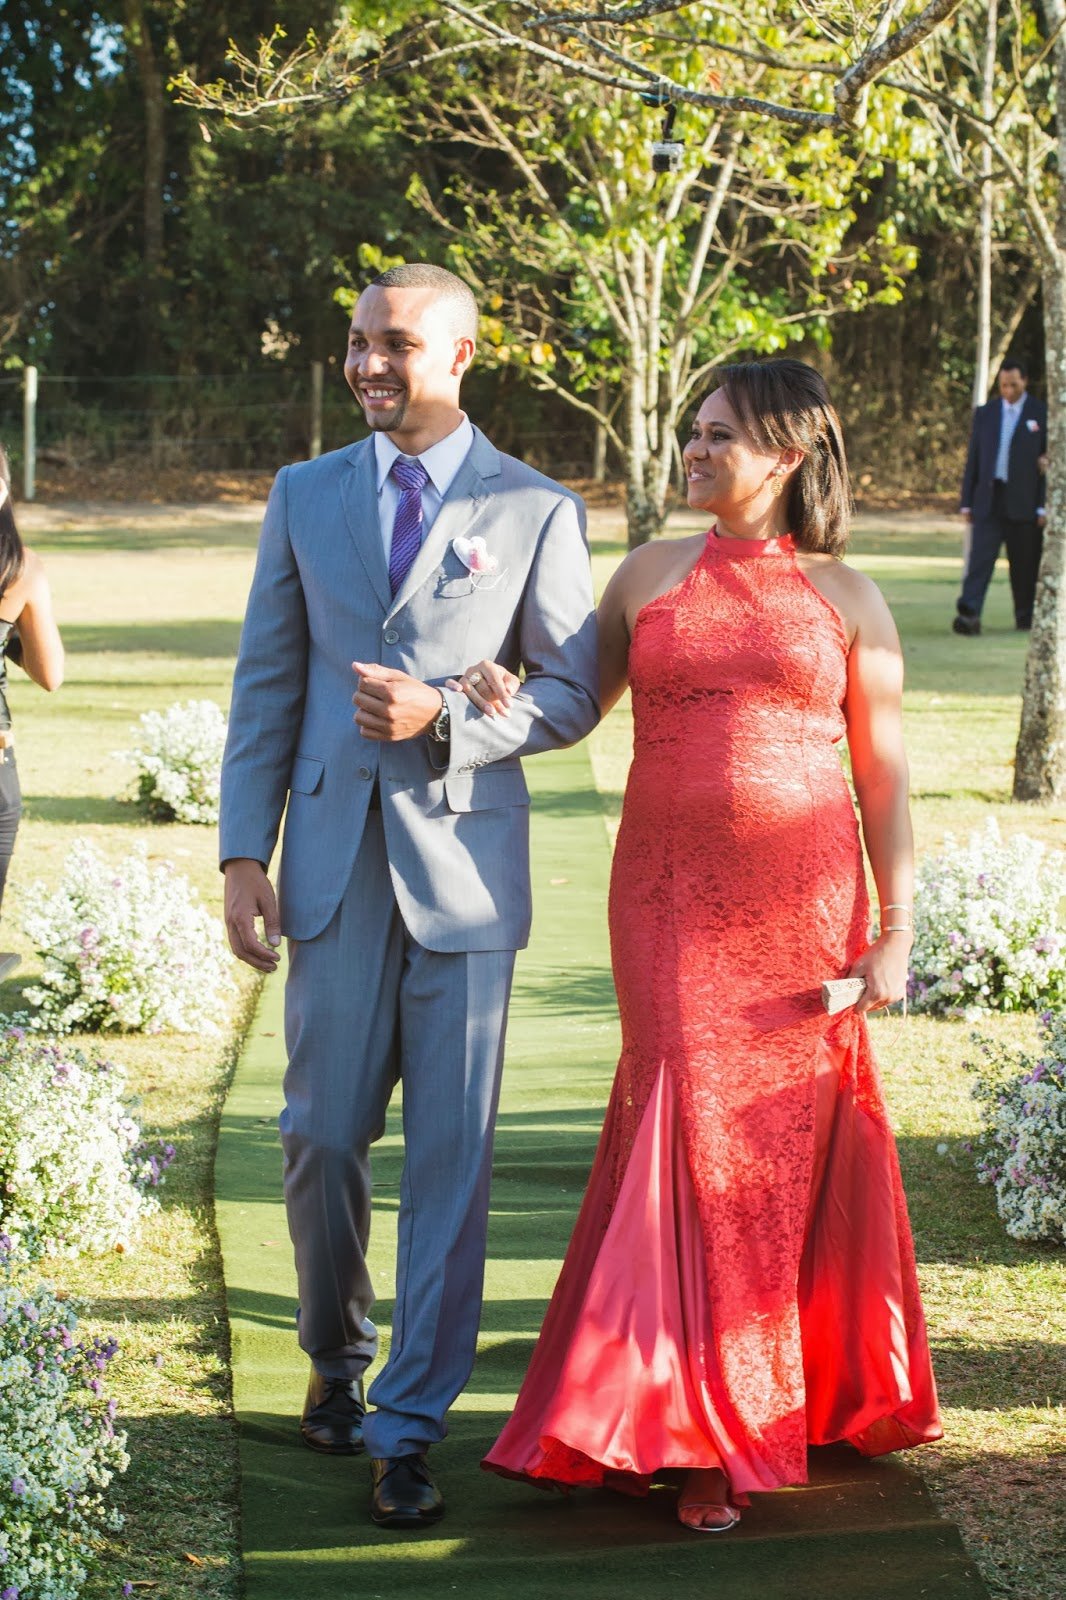 entrada noivo - noivo - mae do noivo - casamento de dia - casamento ao ar livre